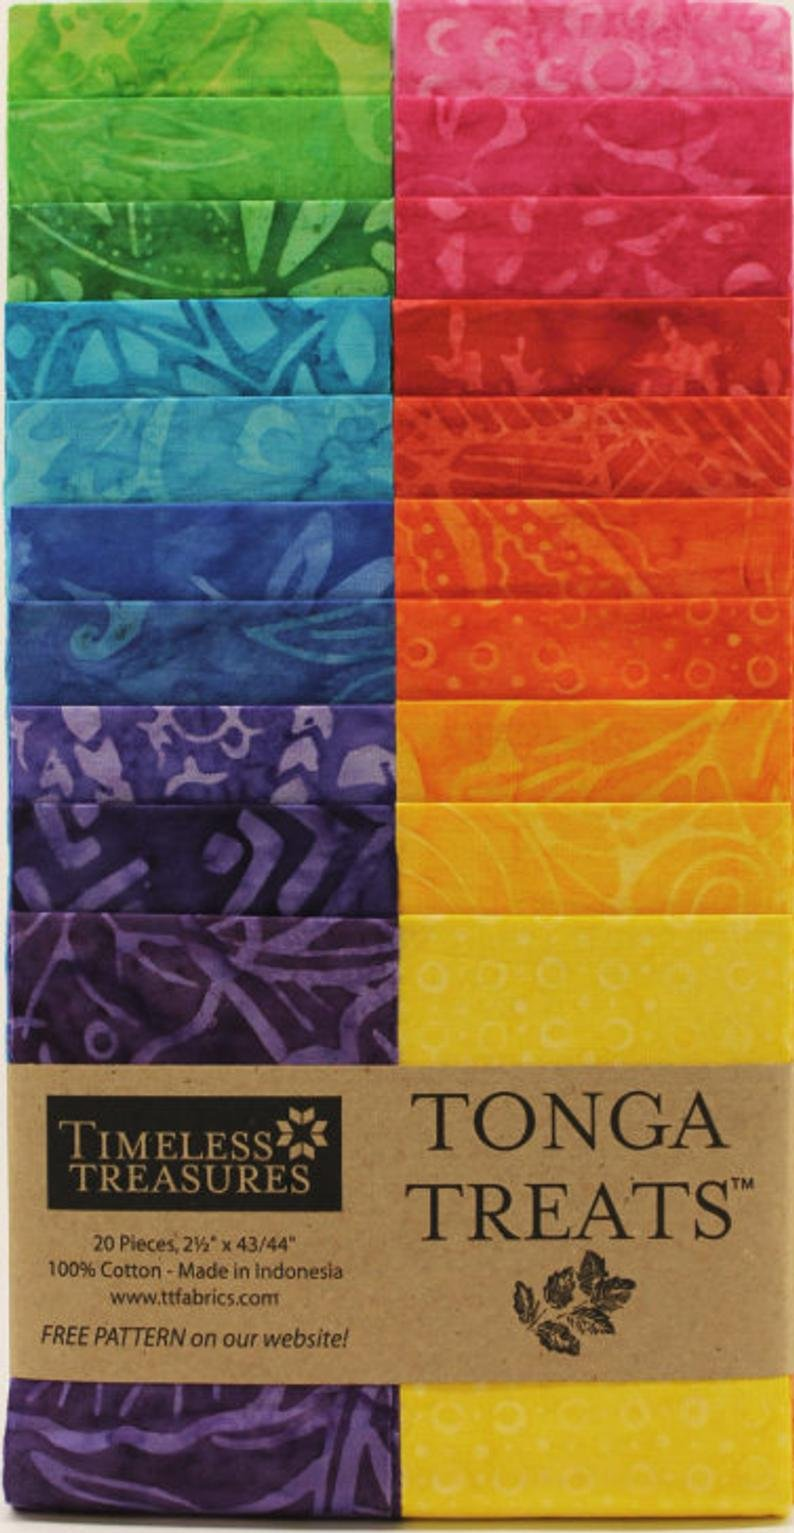 Timeless Treasures Tonga Treat Strip Dazzle Jelly Roll